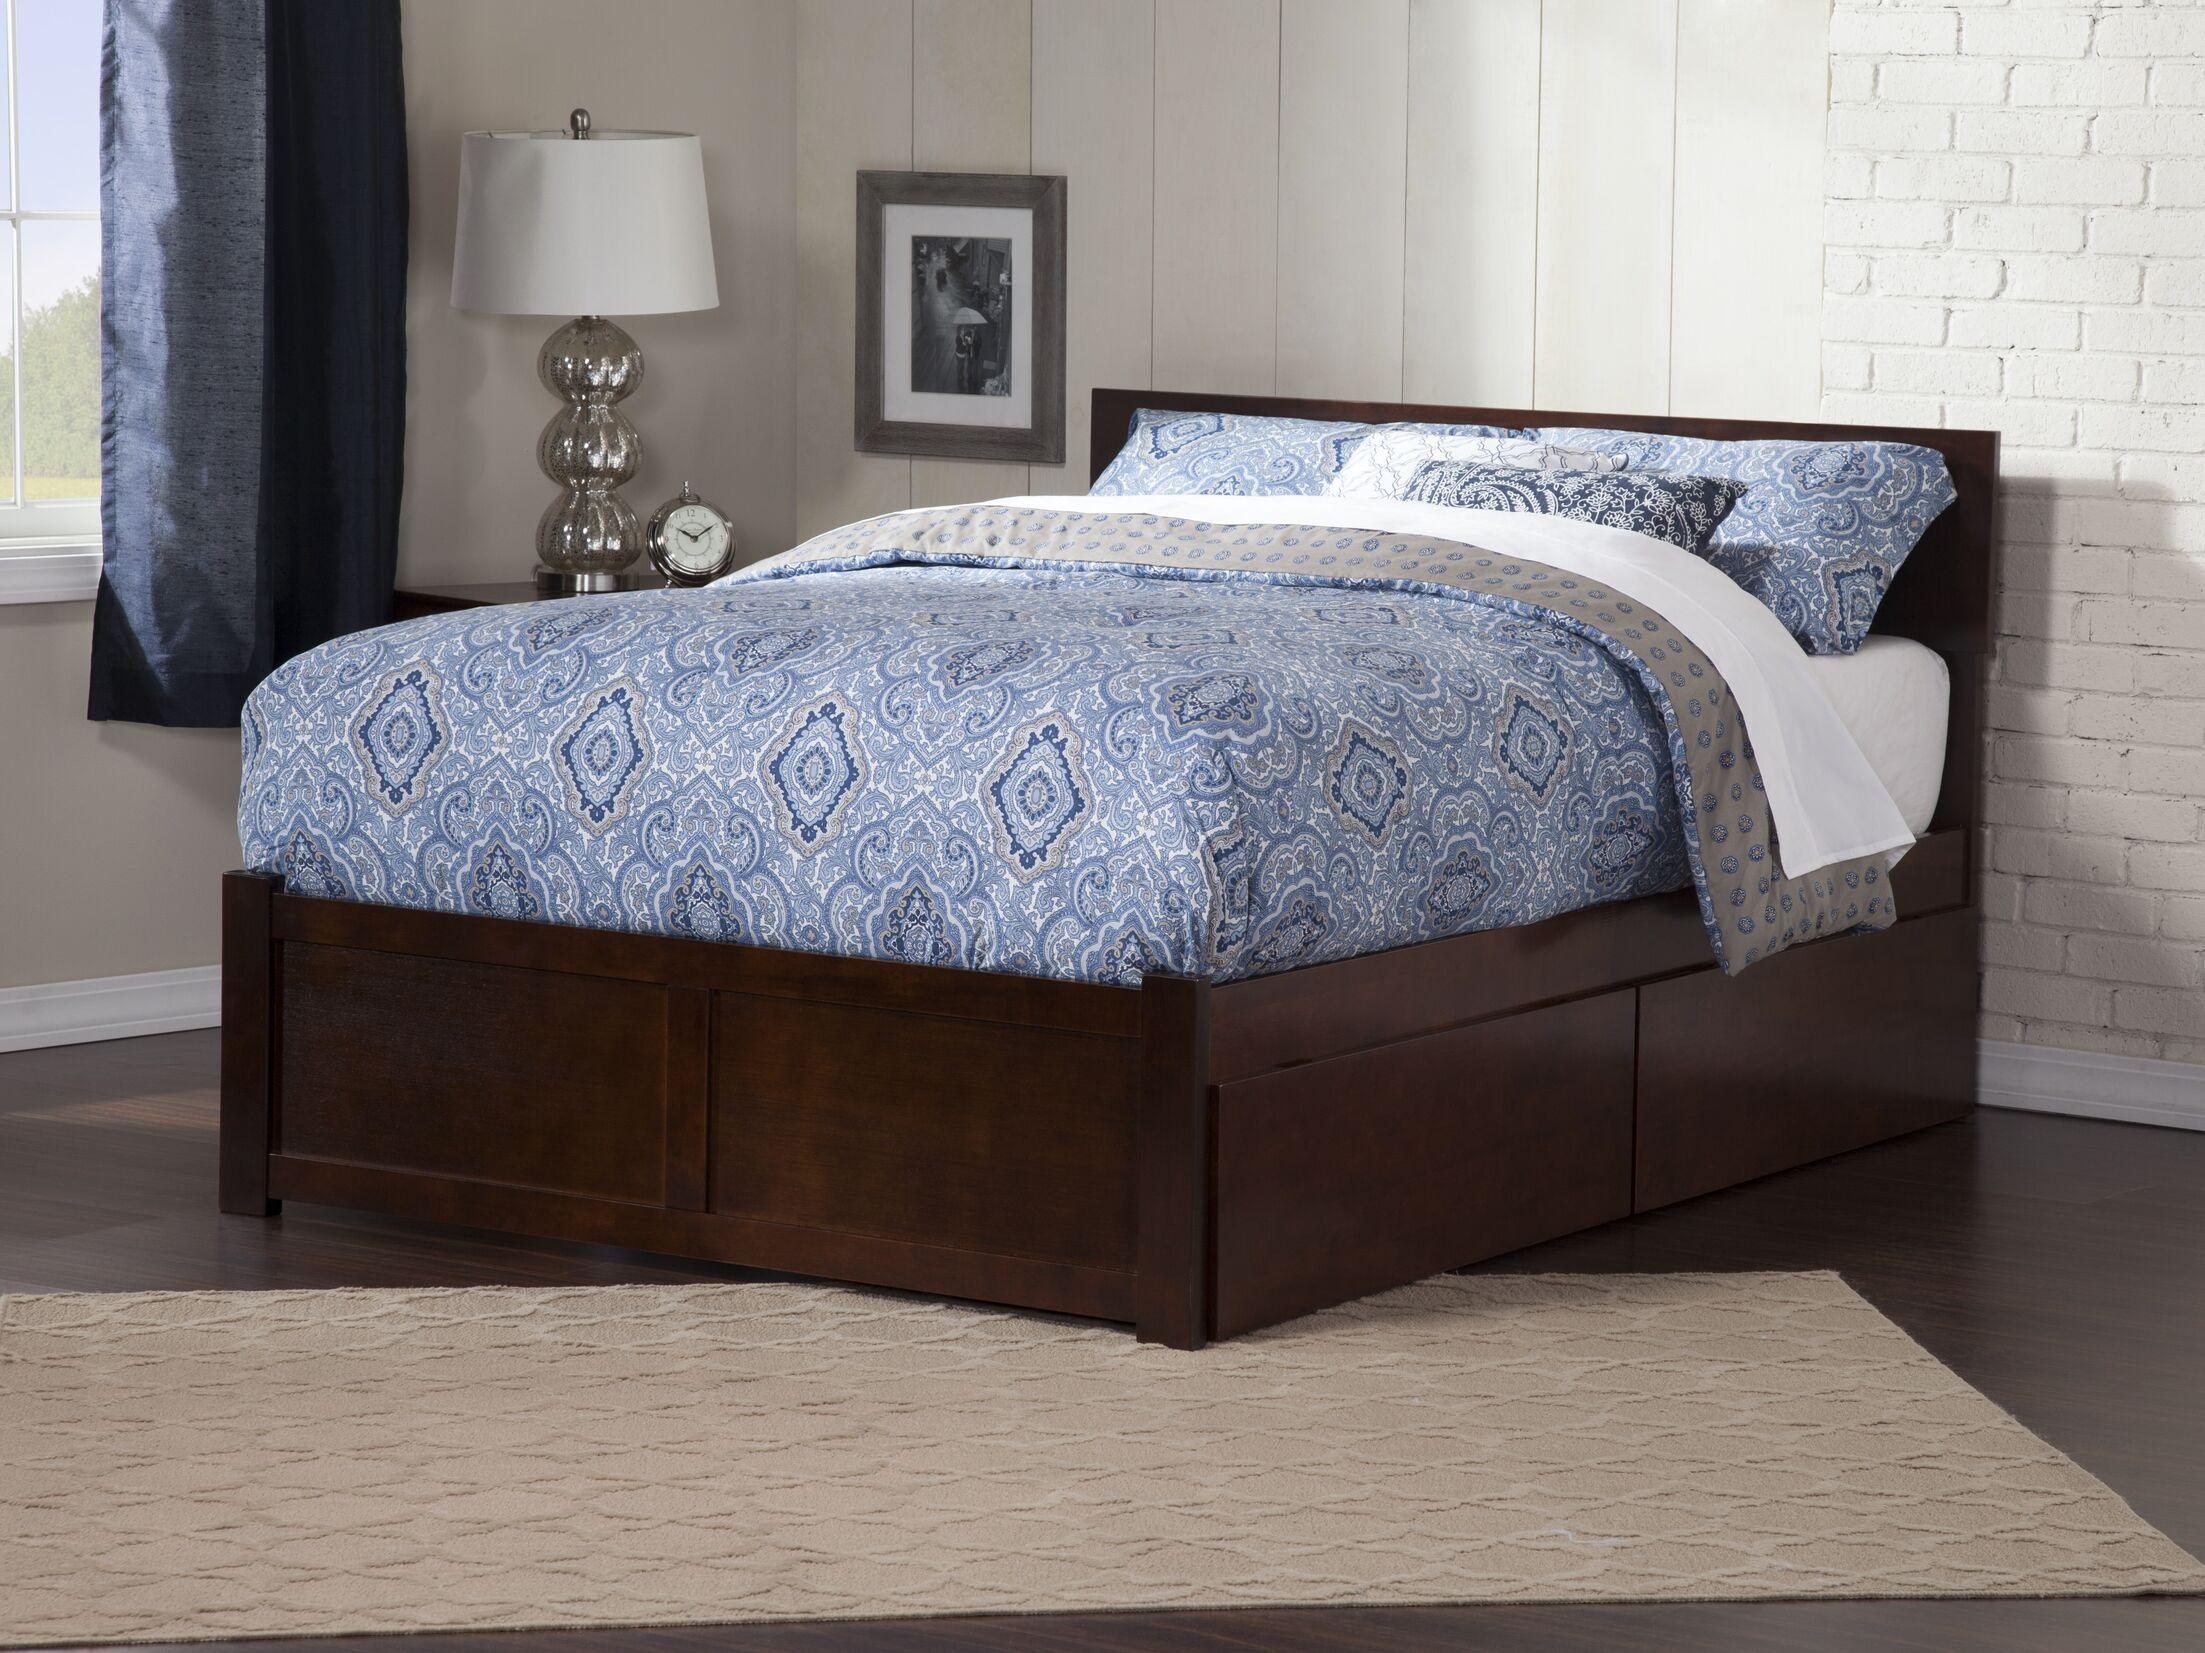 Wrington Storage Platform Bed Size: Twin, Color: Antique Walnut